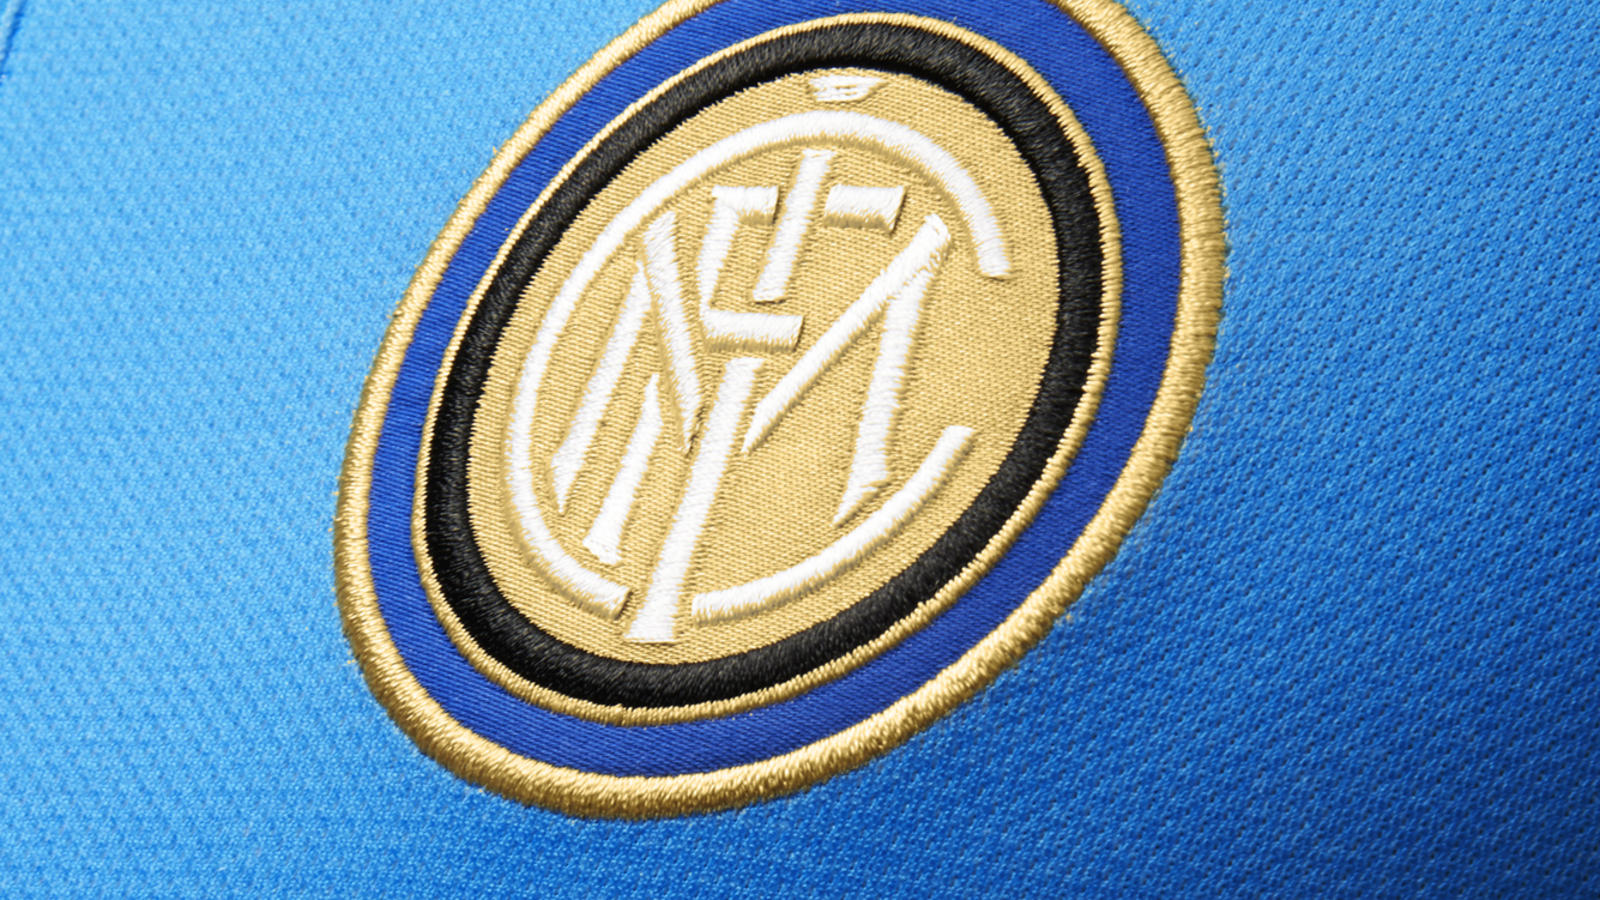 Ho14 Fb Flash Flood Inter Milan Crest